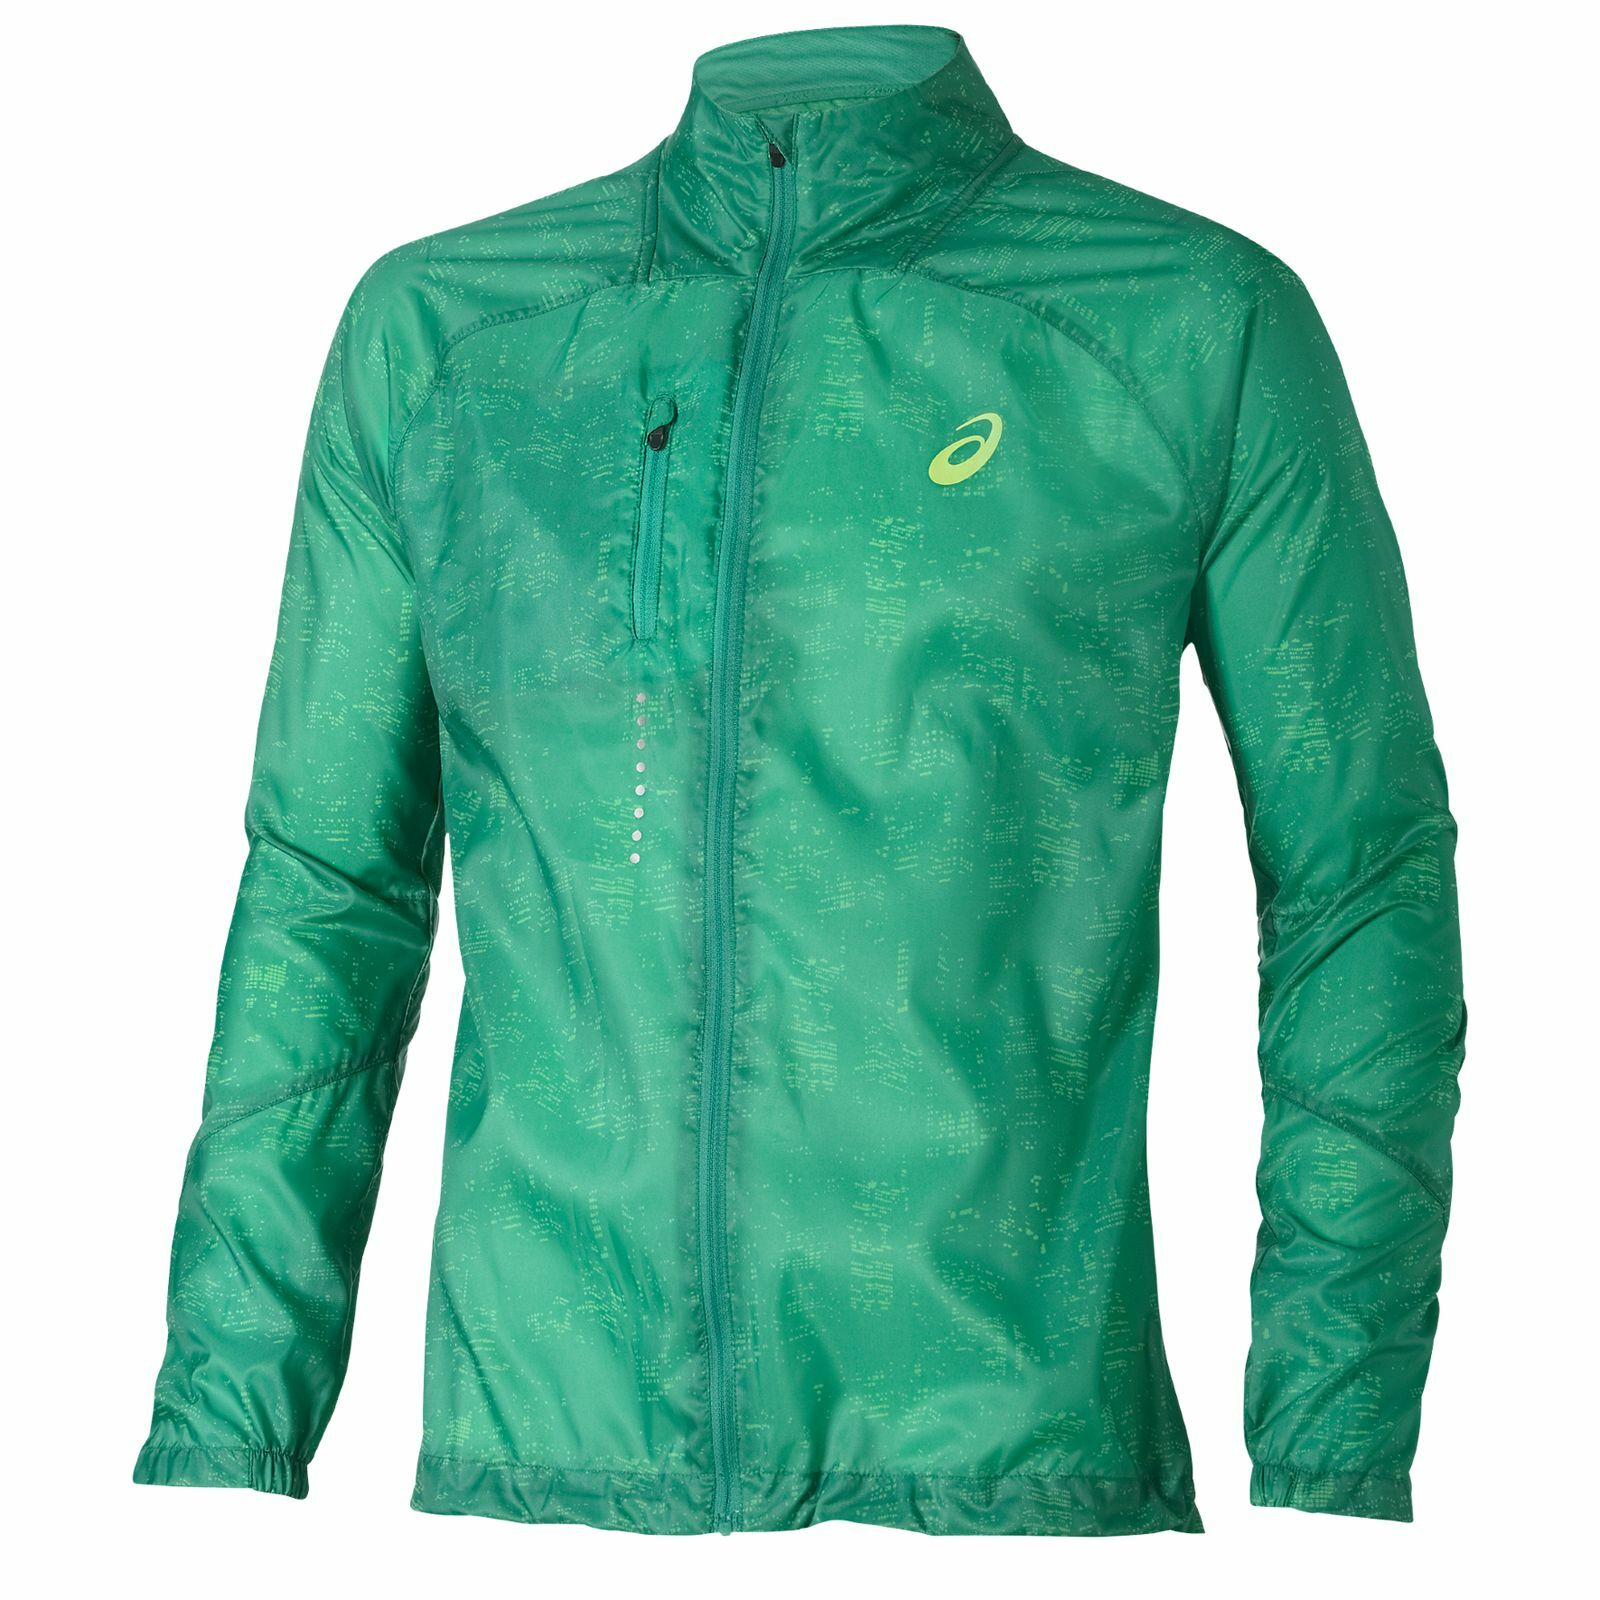 ASICS lightweight jacket-Uomo-Corsa Giacca-RUNNING-Taglia S - - - 121627-5015 765206